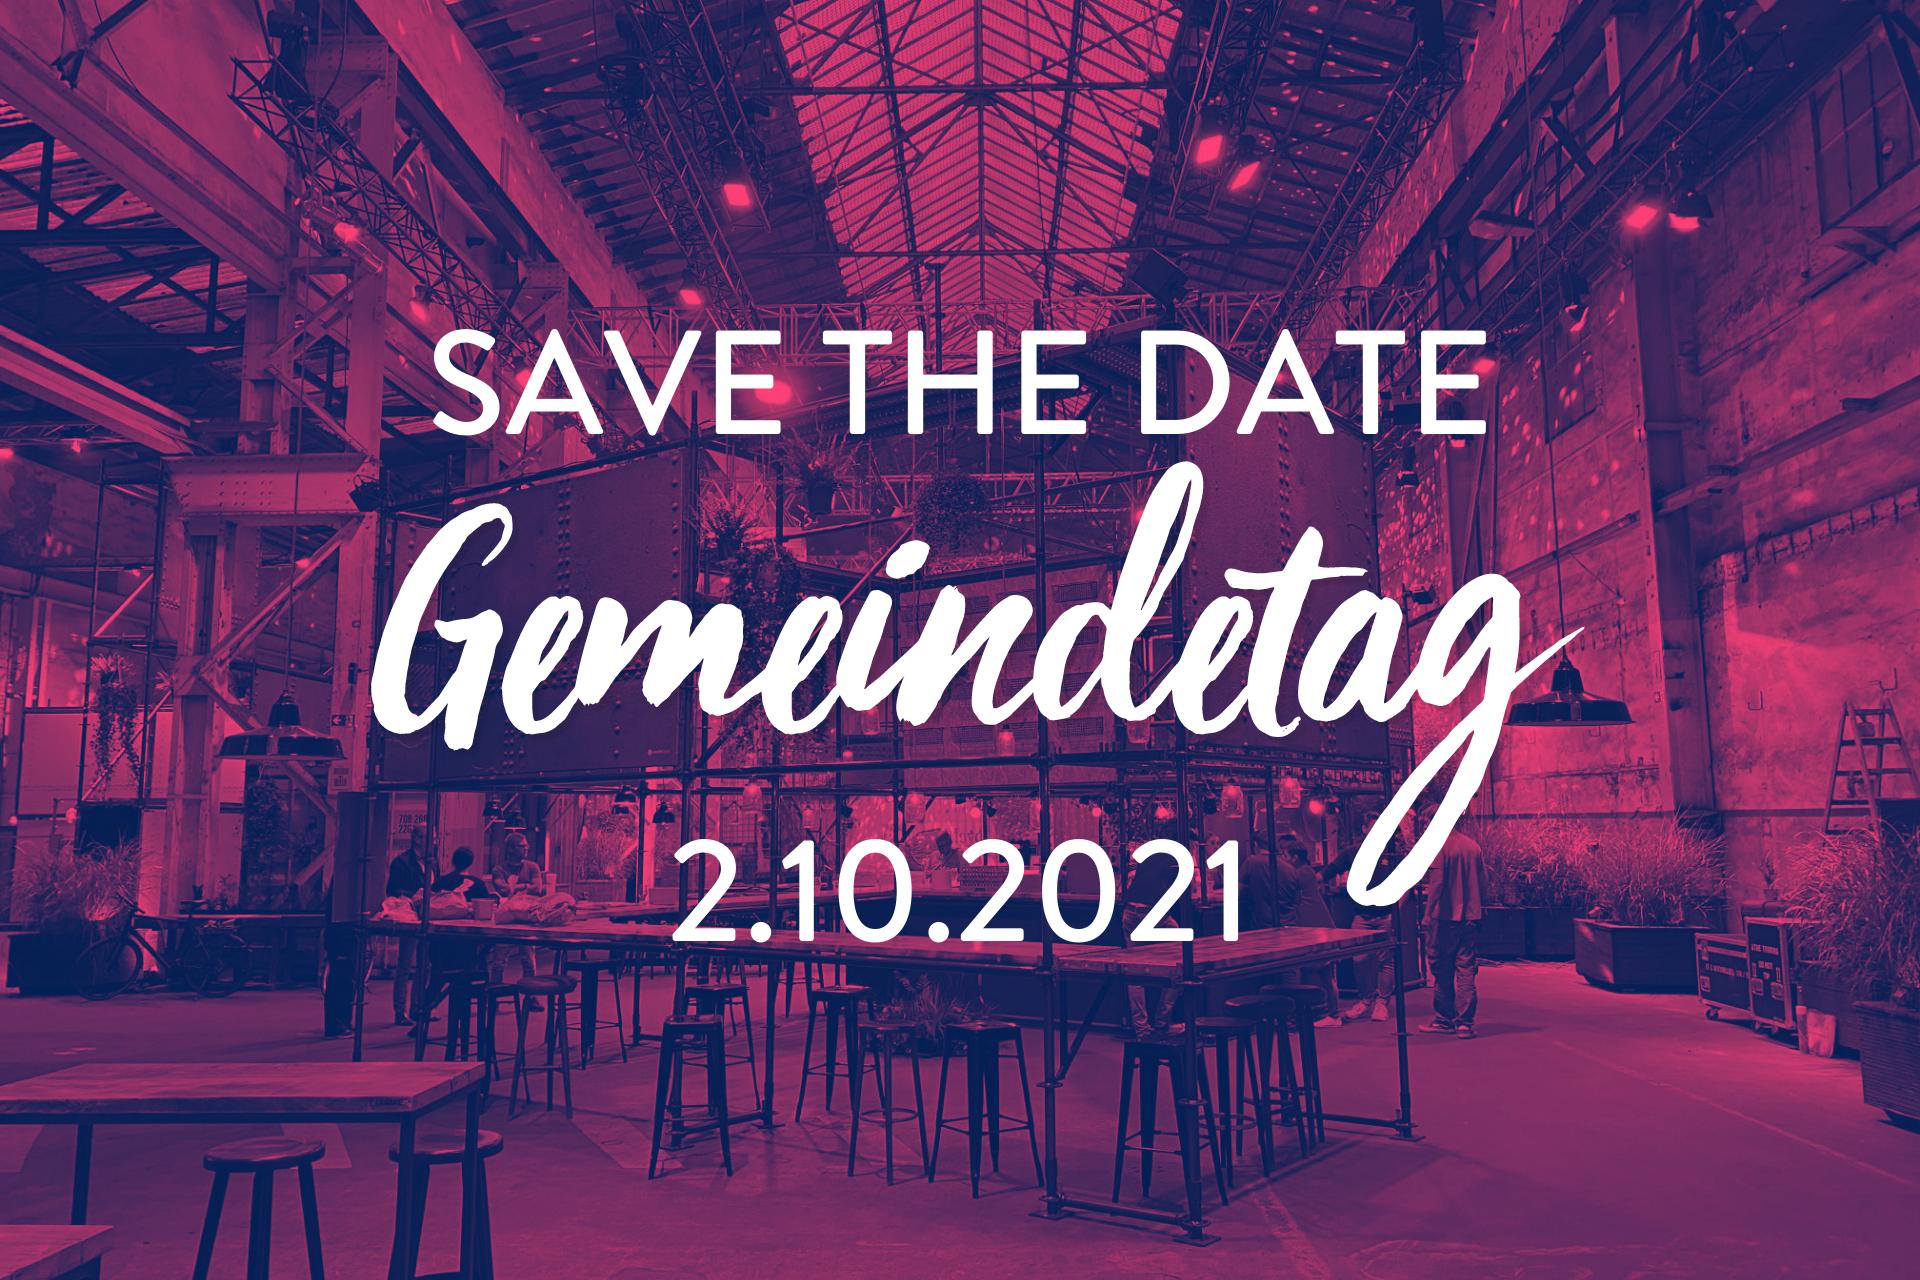 Gemeindetag am 2. Oktober 2021